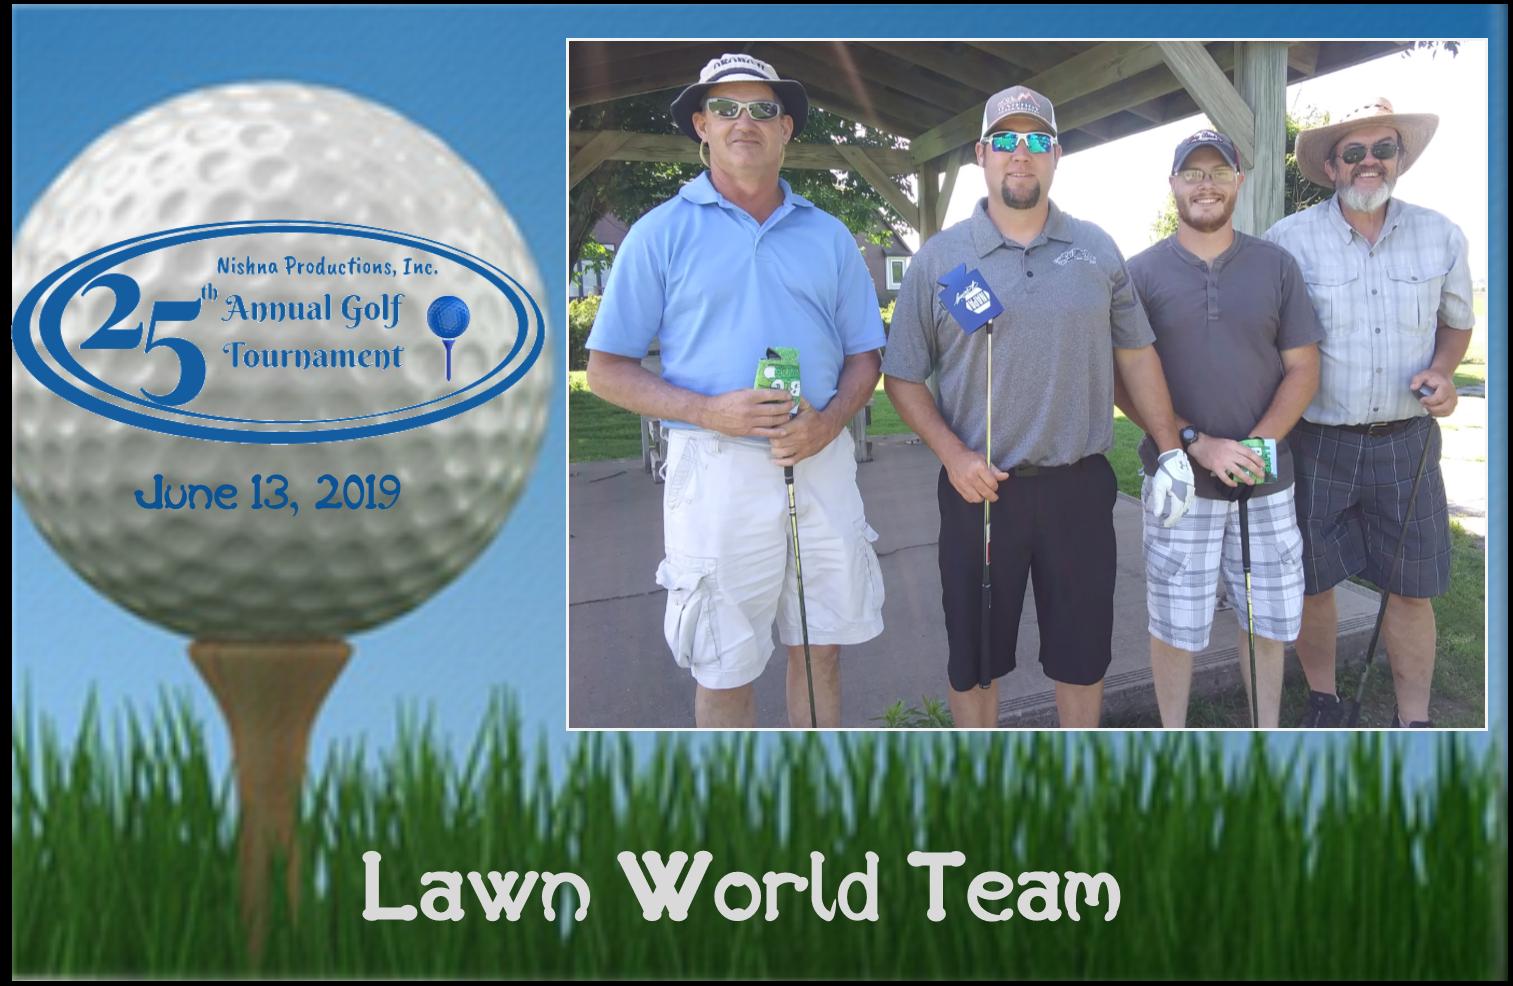 Lawn World Team